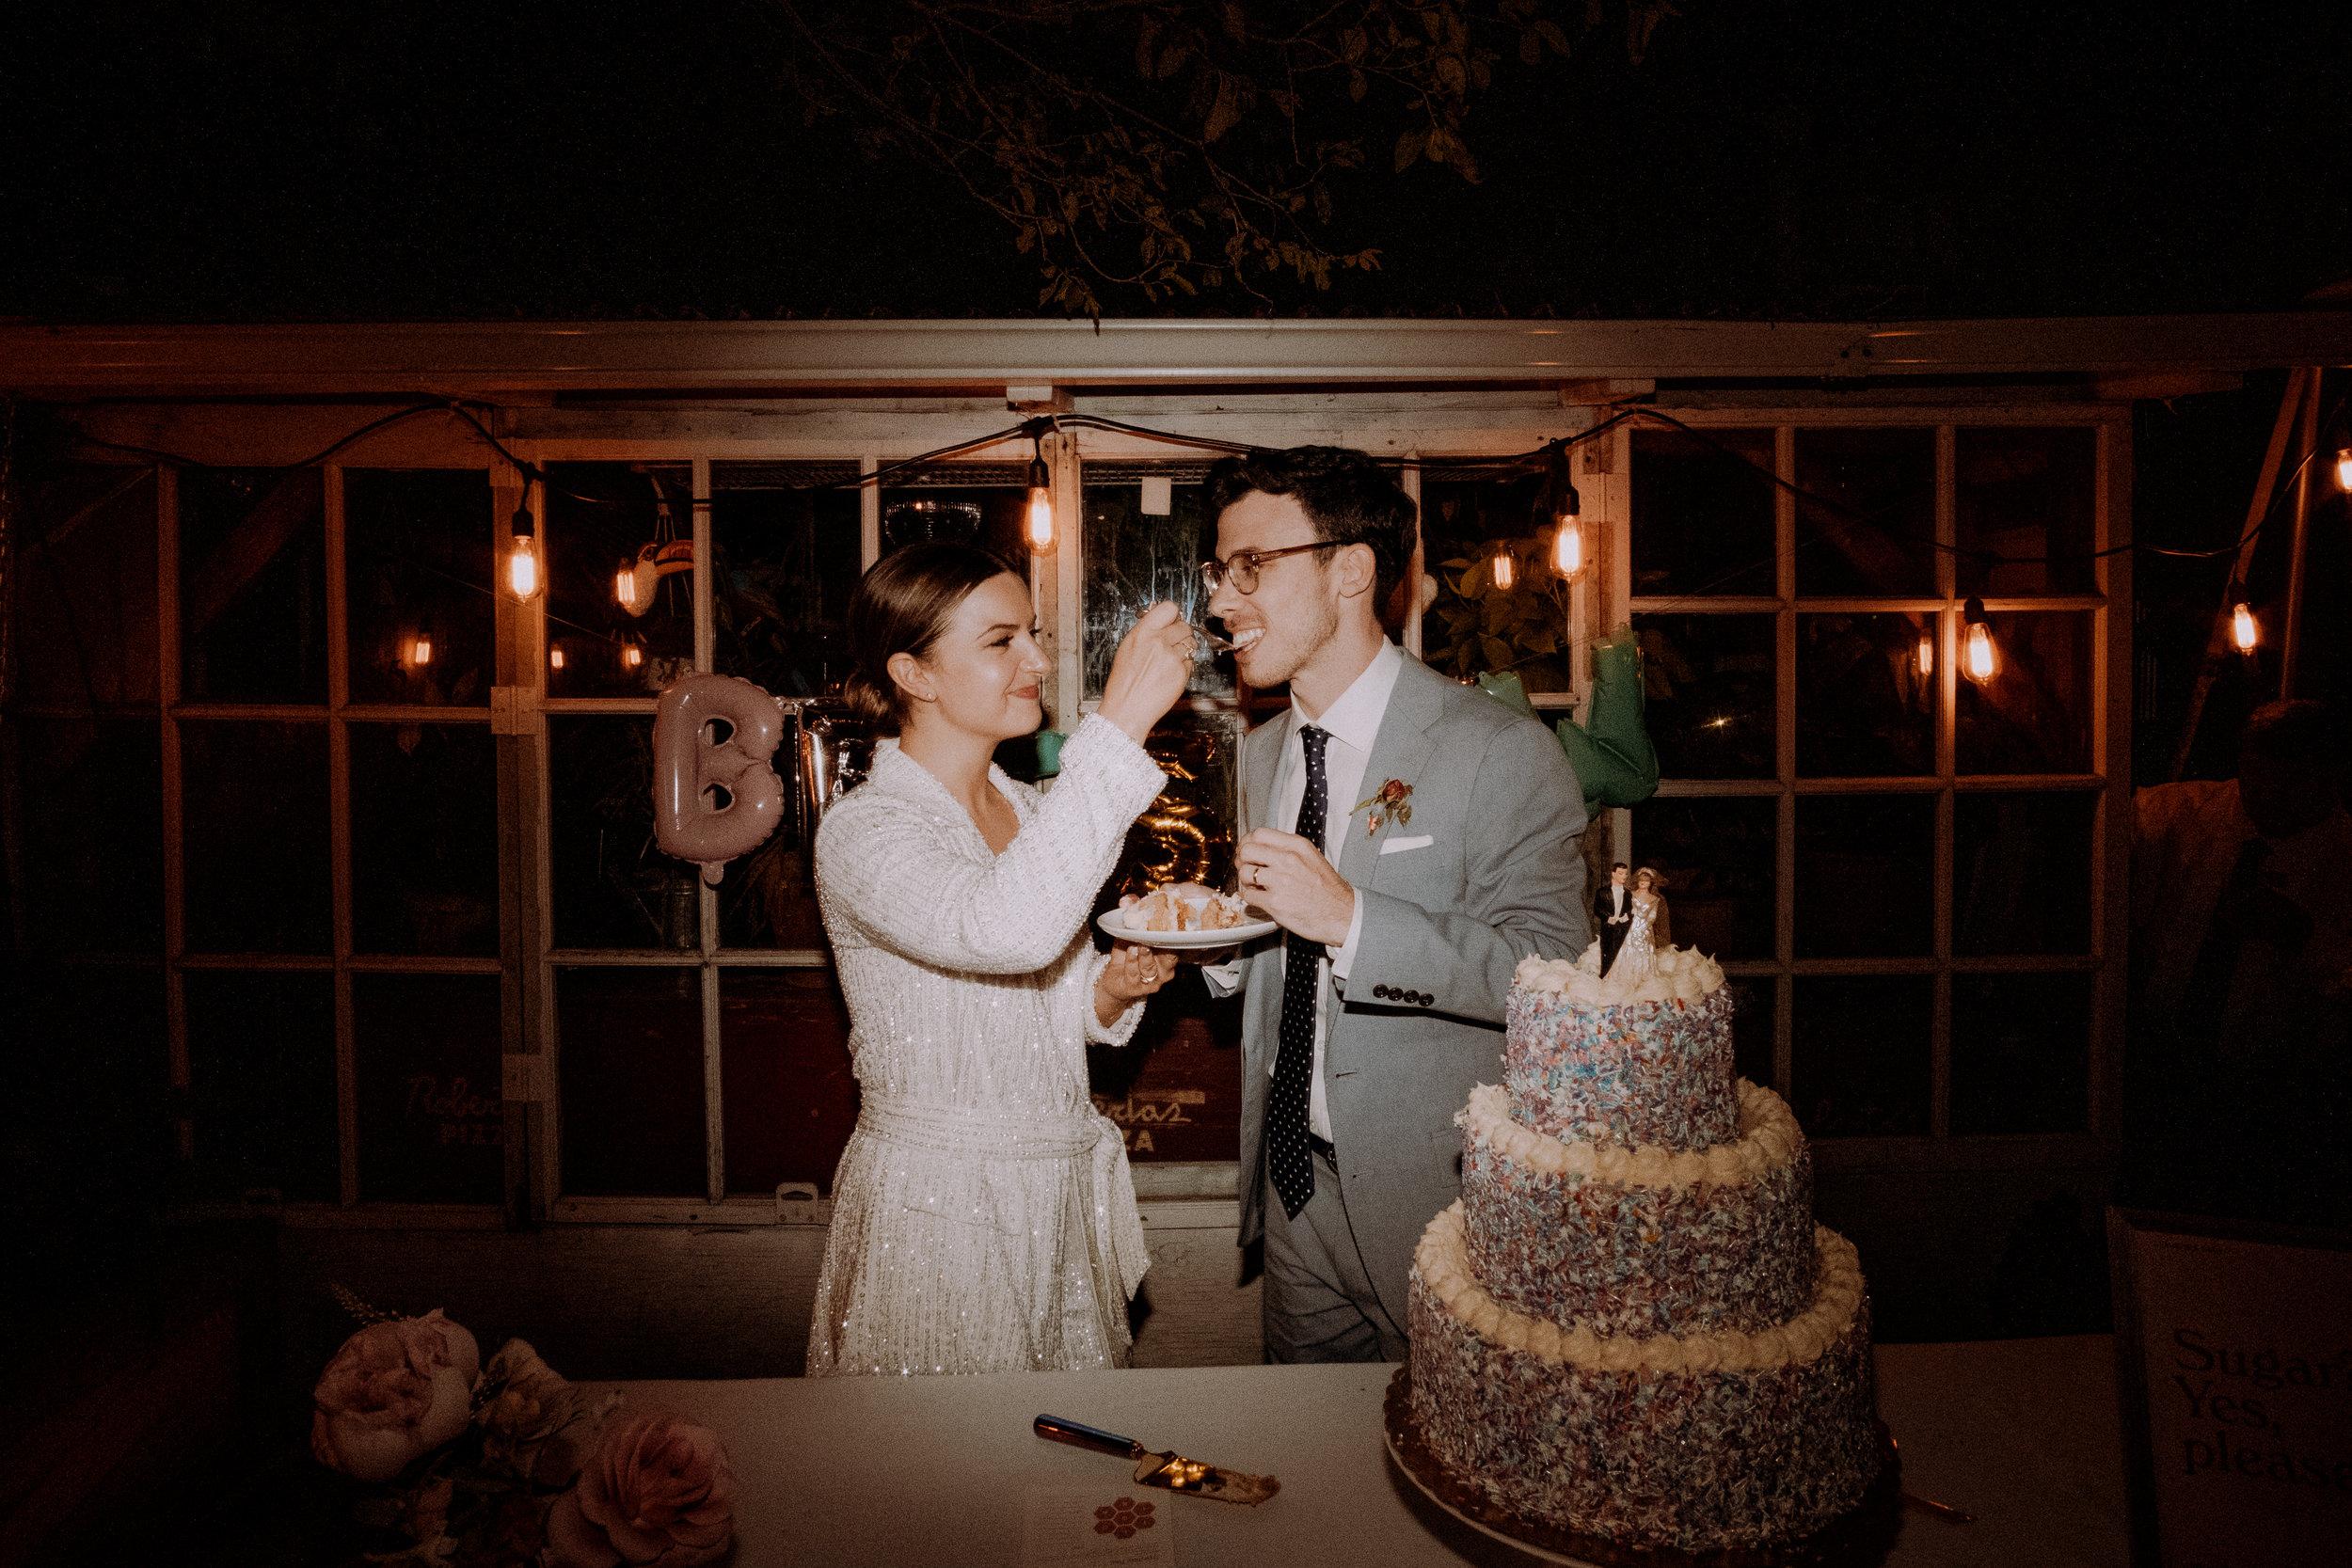 Chellise_Michael_Photography_Robertas_Brooklyn_Wedding_Photographer-830.jpg